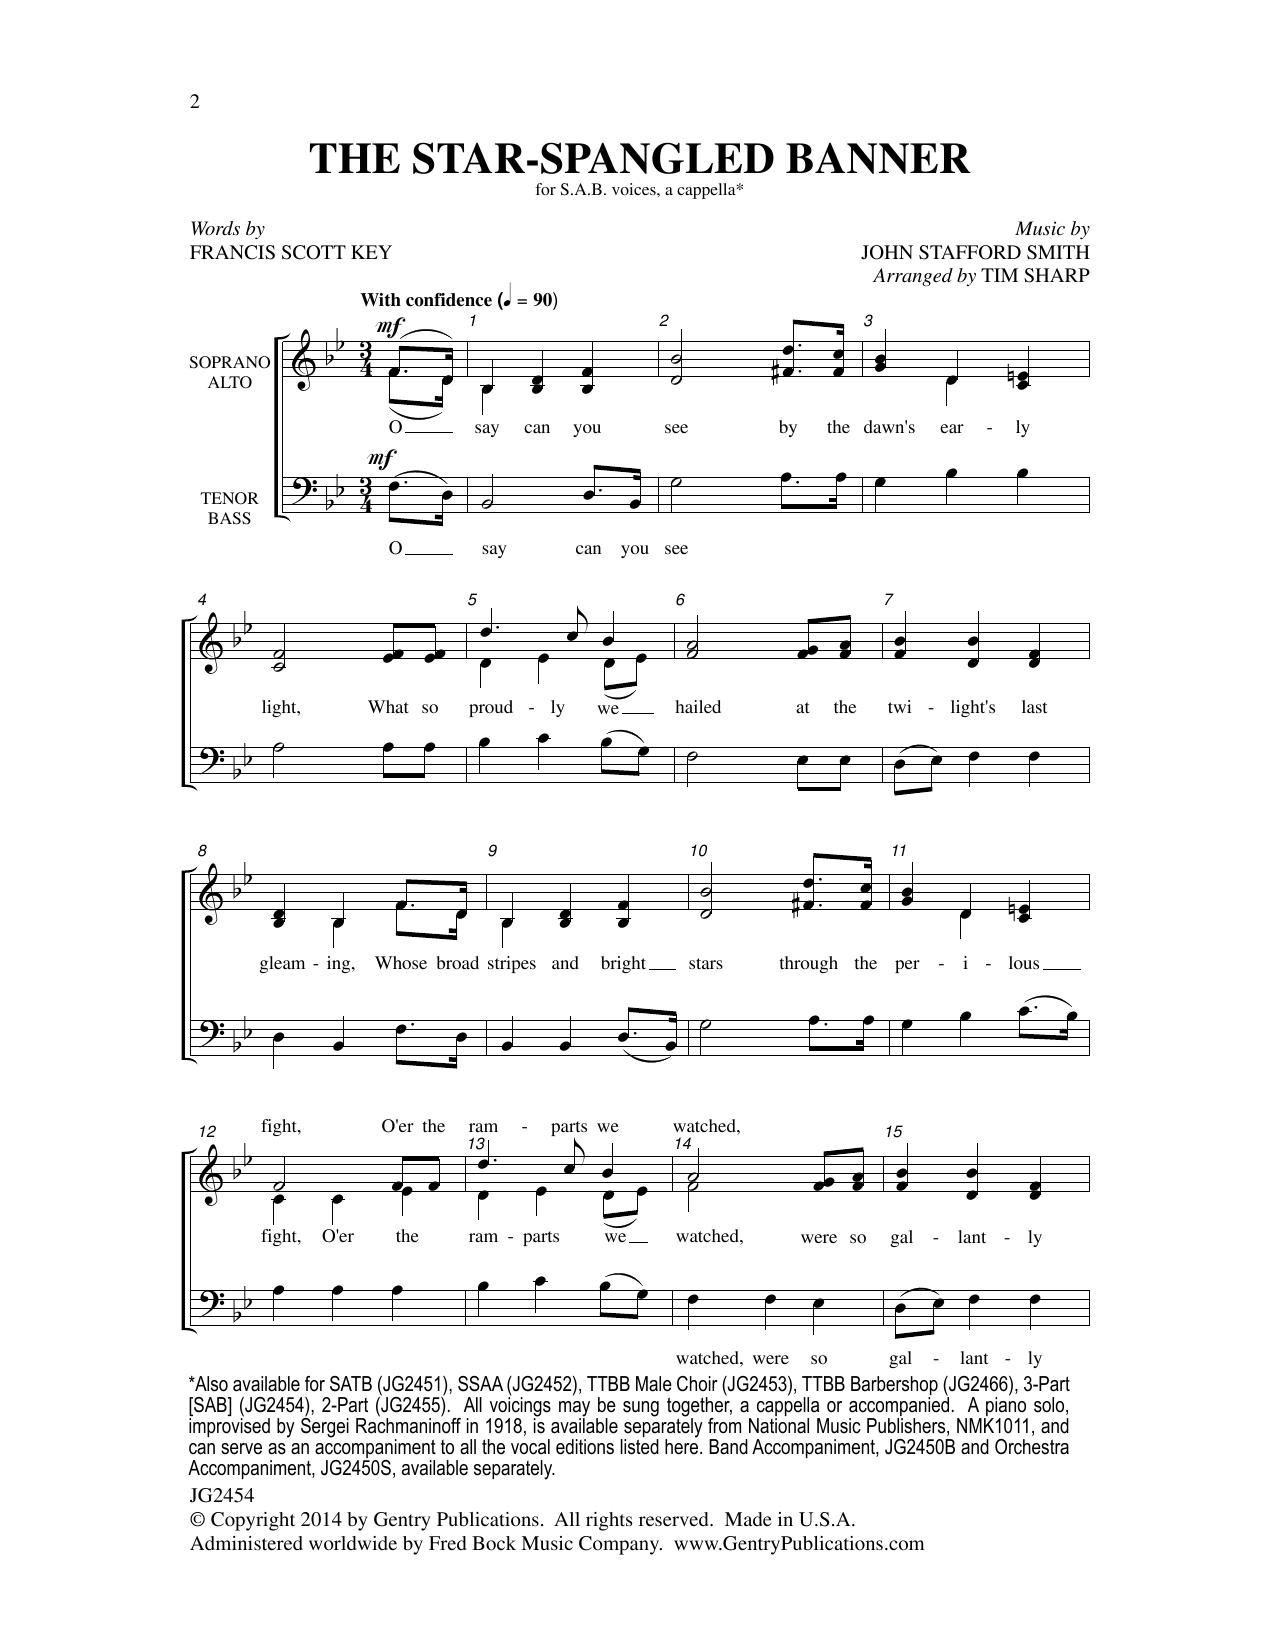 The Star-Spangled Banner Sheet Music